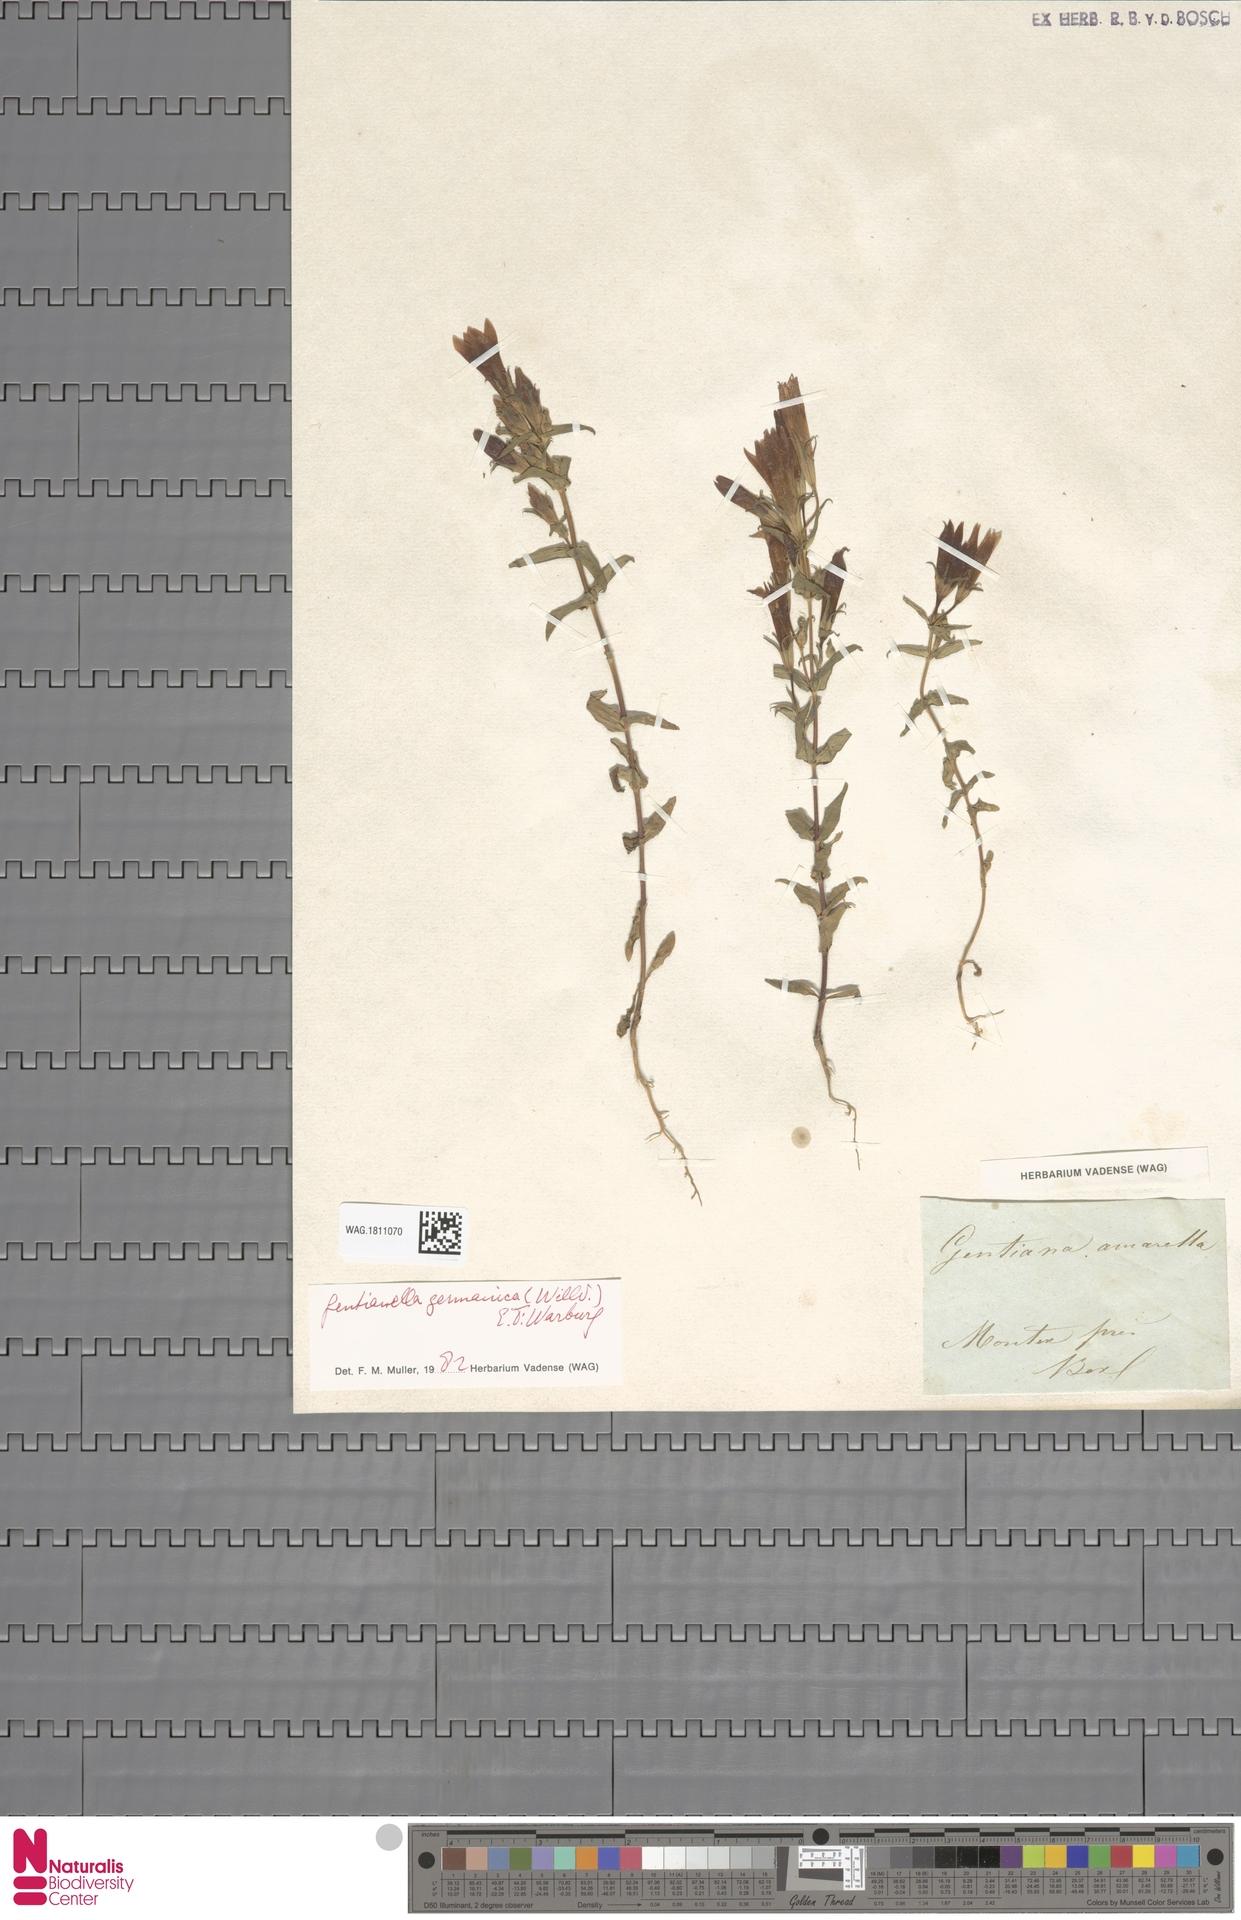 WAG.1811070 | Gentianella germanica (Willd.) E.F.Warb.